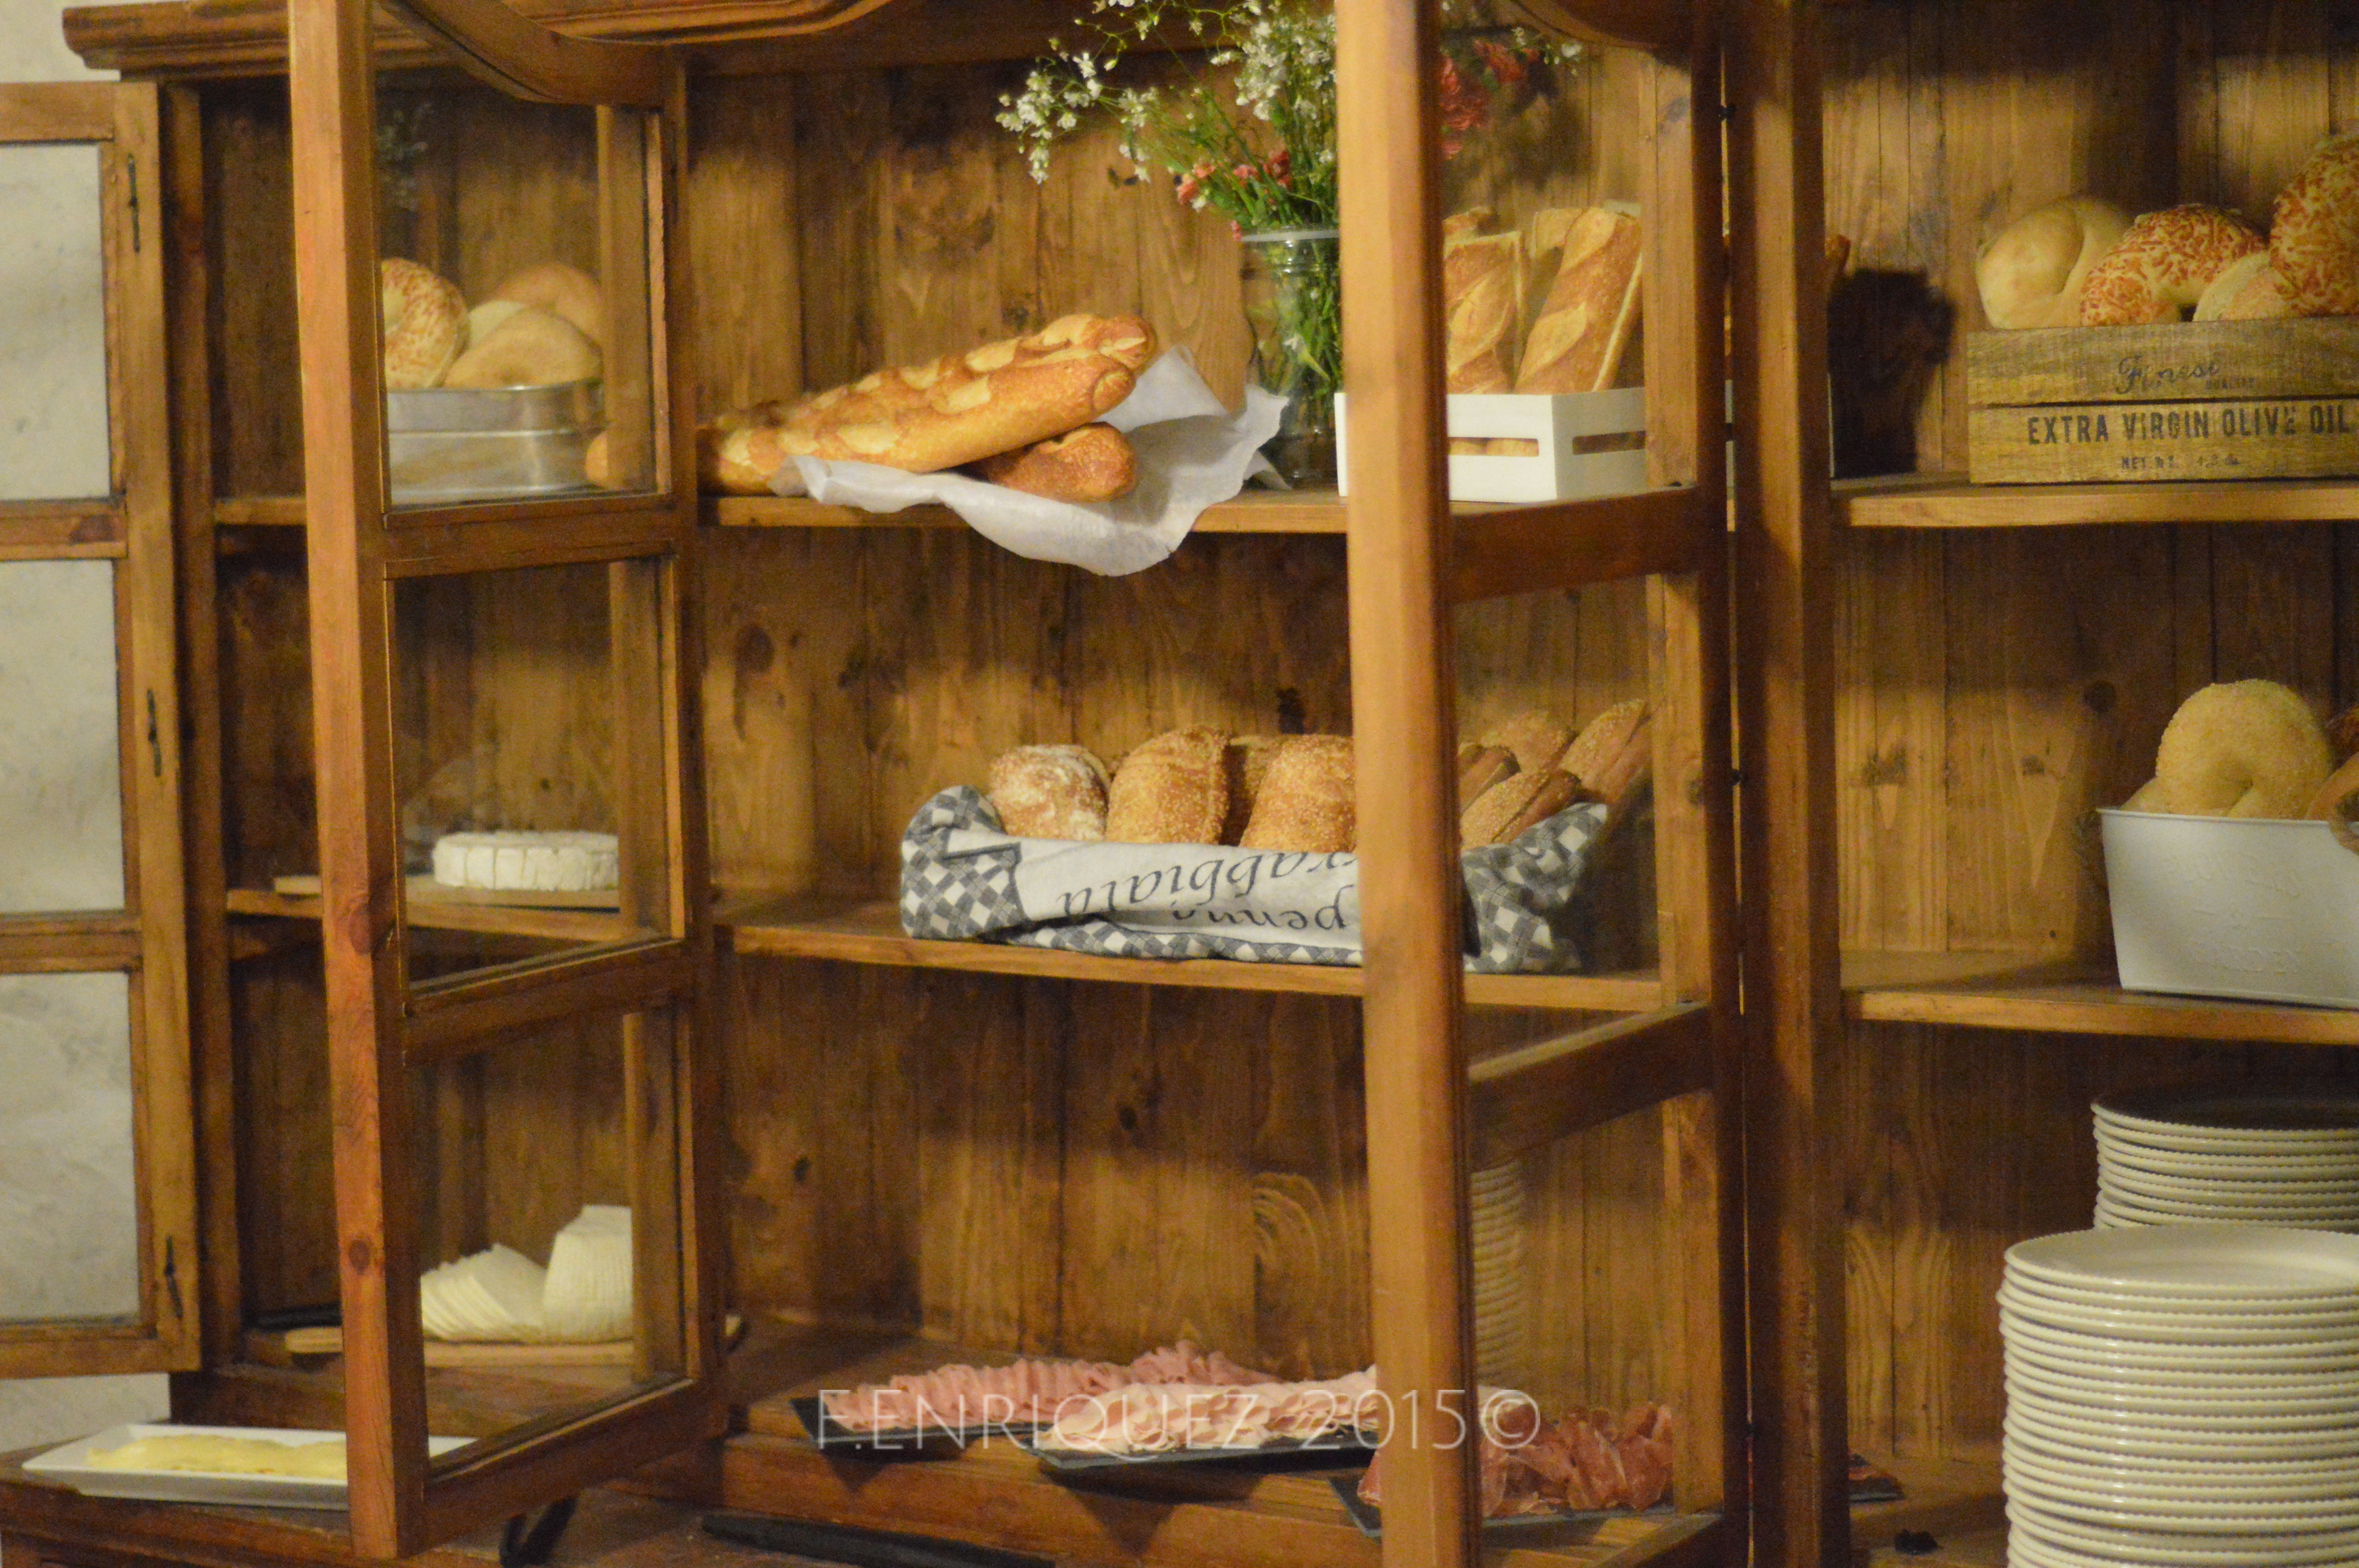 Barra de Sandwiches